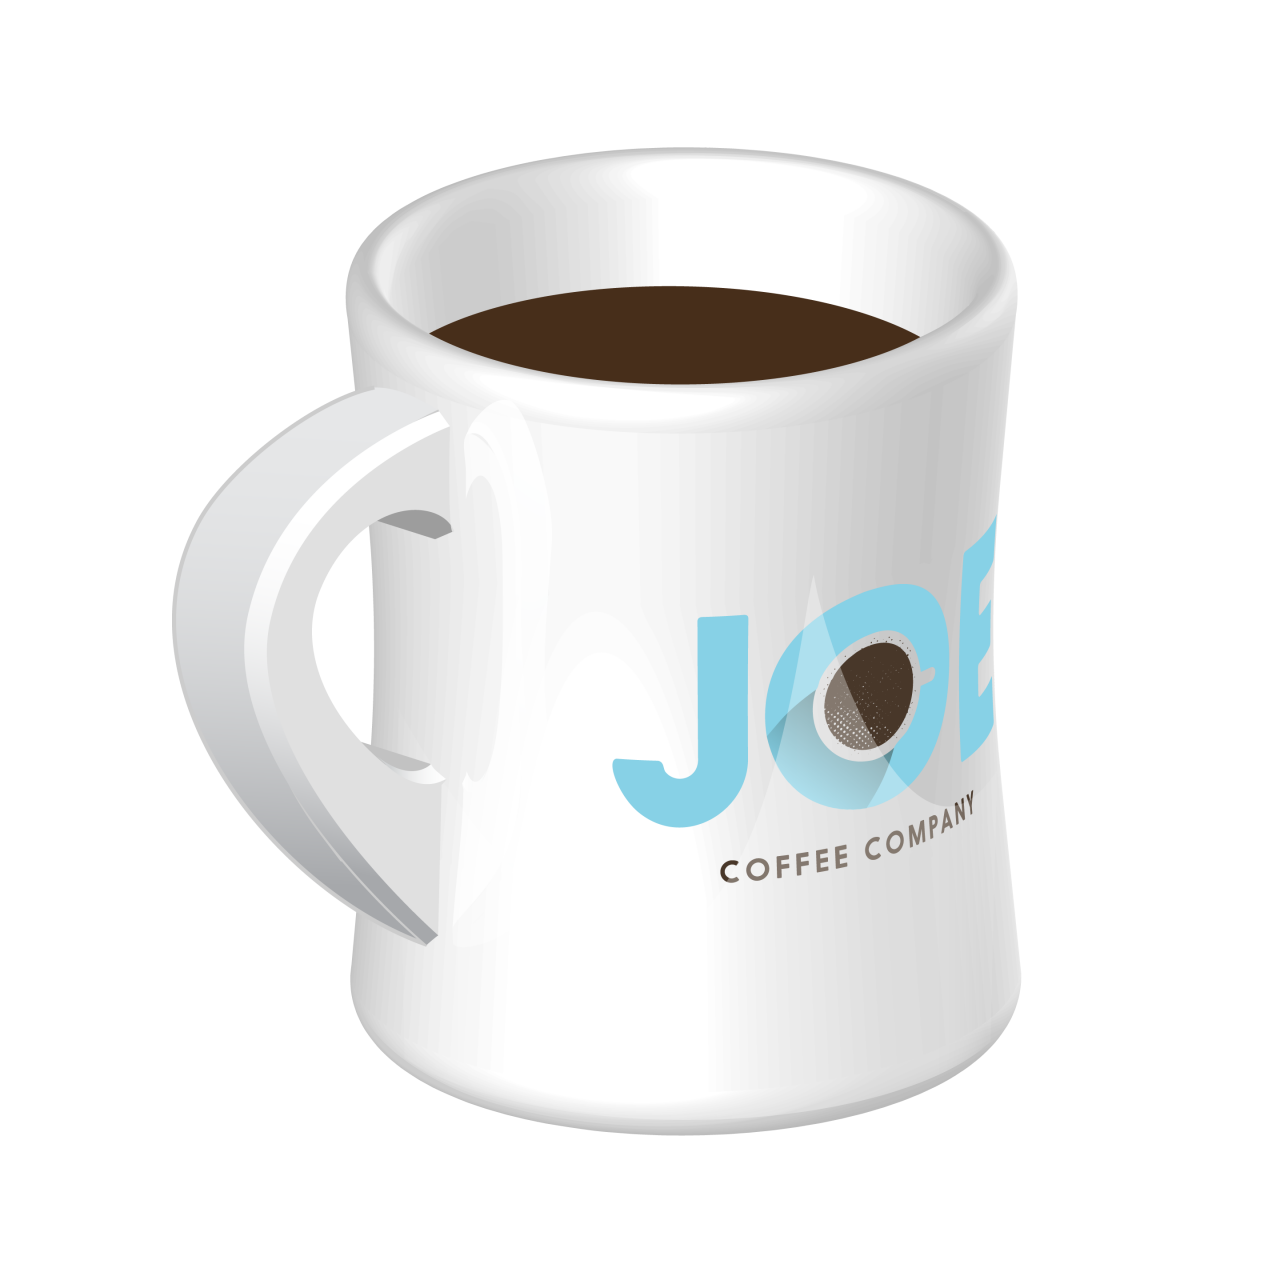 Diner mug with a Joe Coffee Company logo